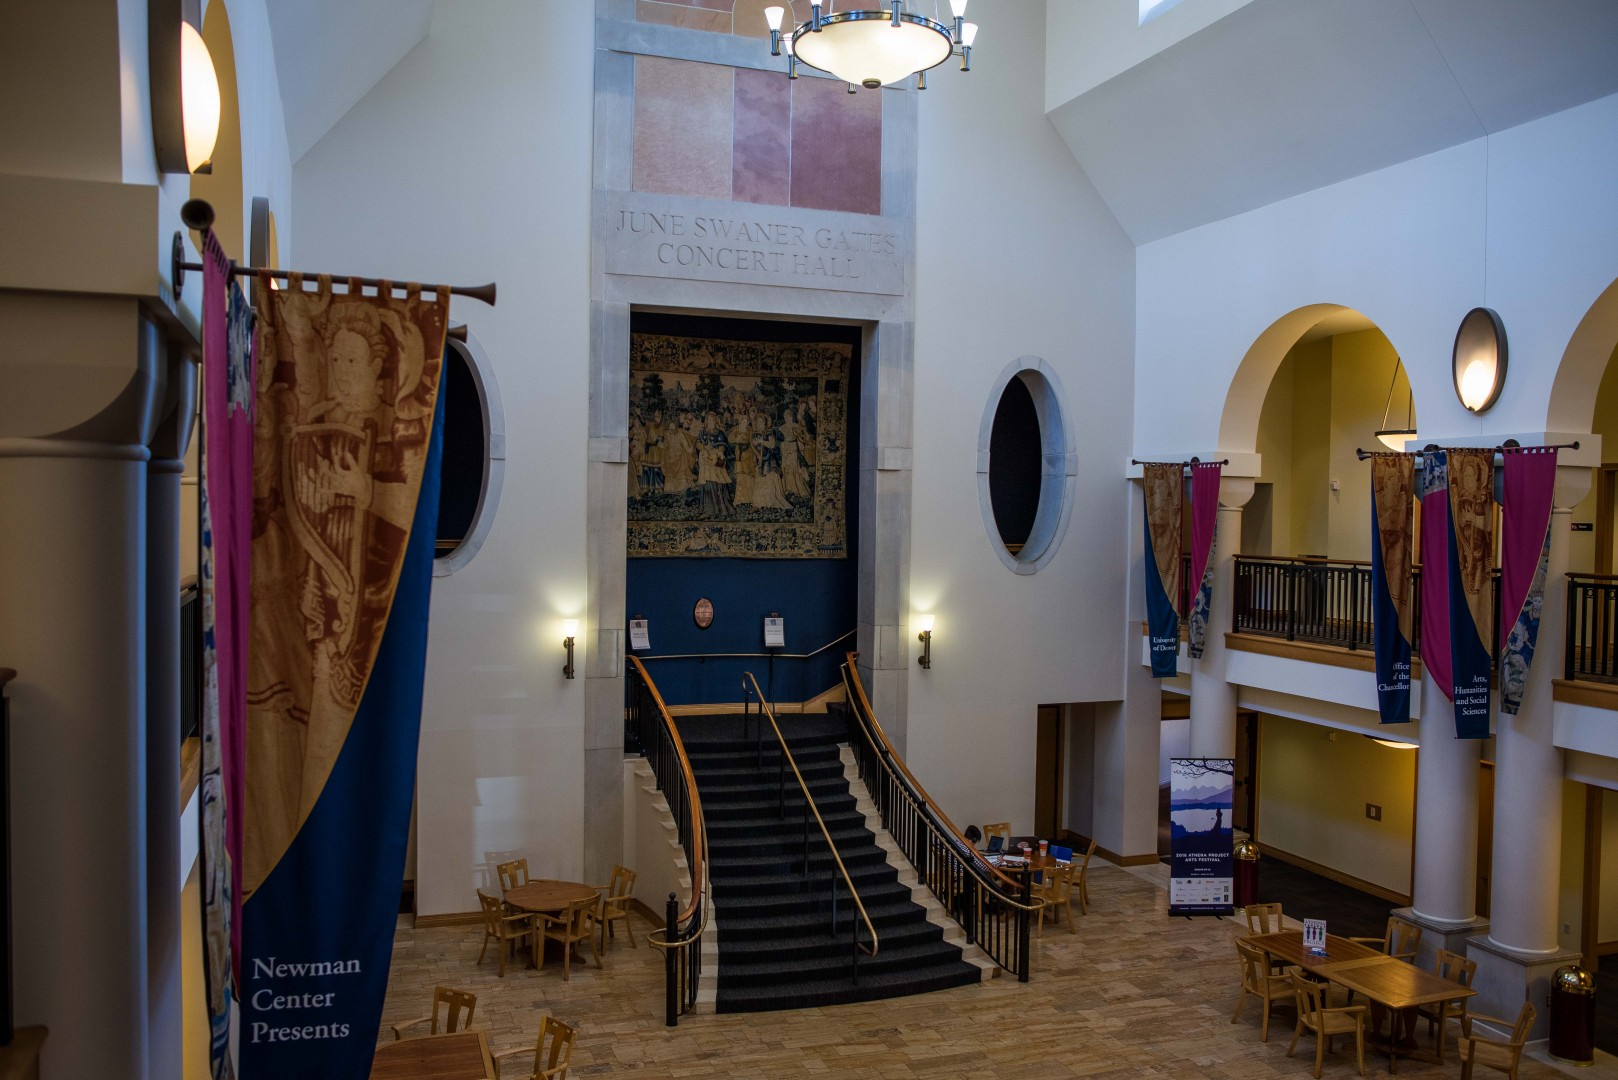 Recital Season Begins At Lamont – Du Clarion Pertaining To Lamont School Of Music Schedule